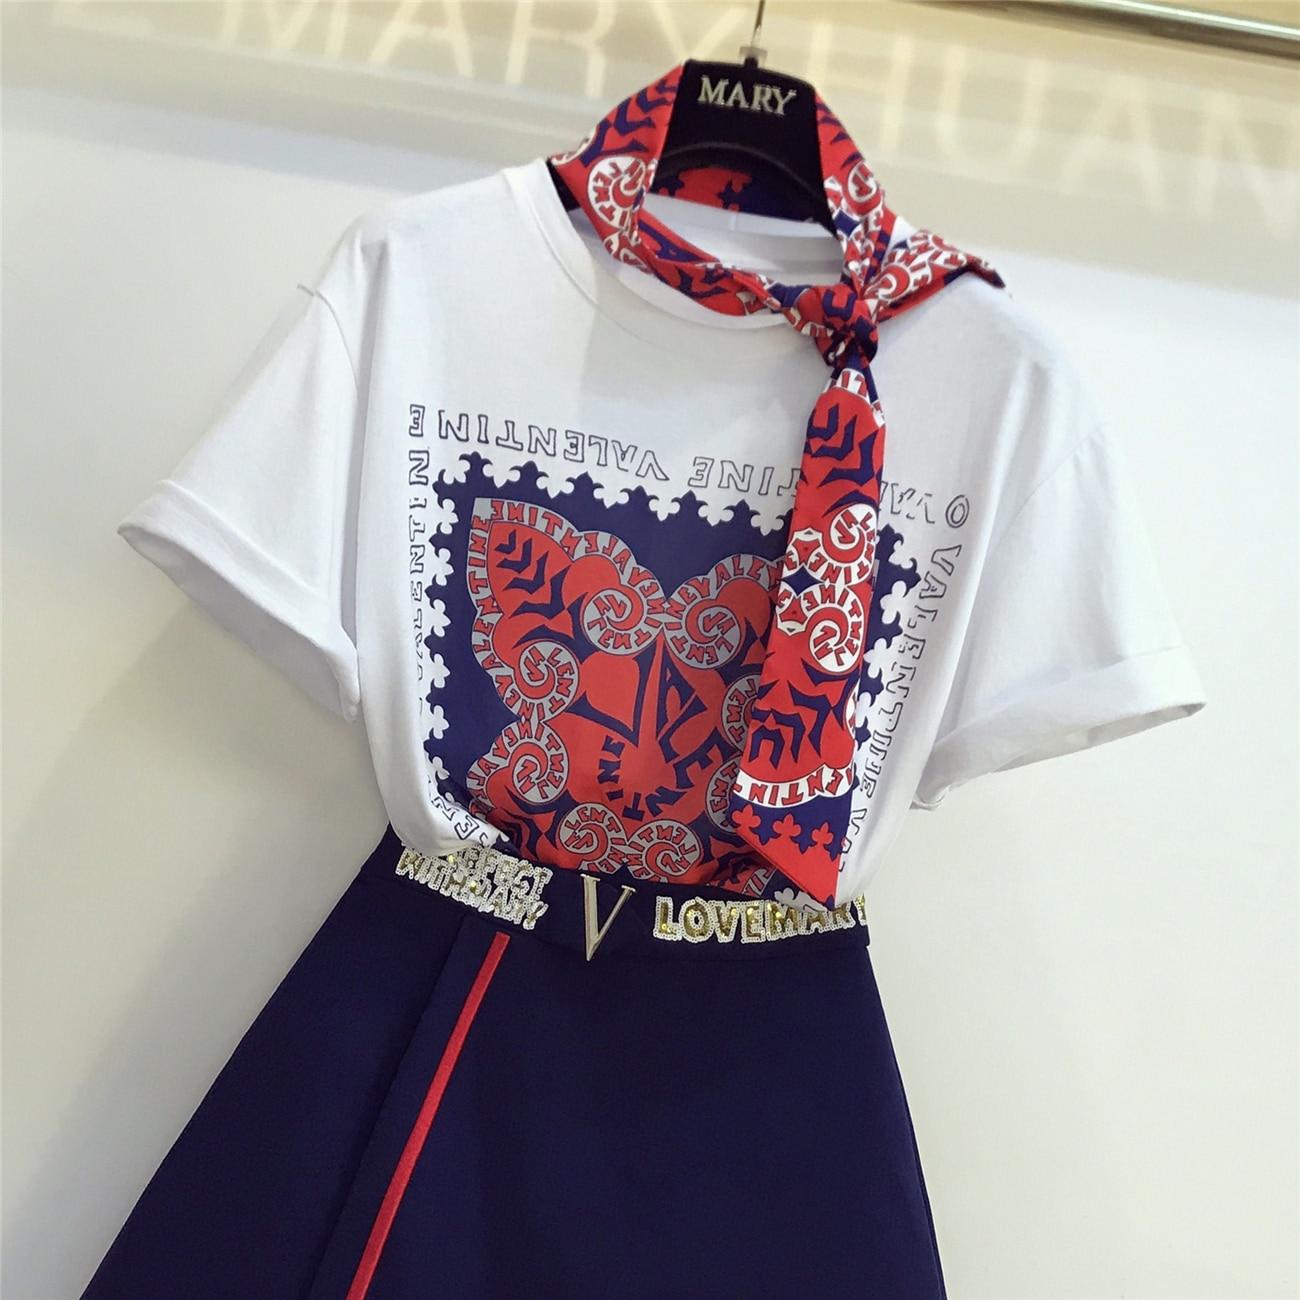 2019 Spring Summer Women 2 Peice Set Fashion Short Sleeve T-shirt + Sequins Letter Mini Skirt Ladies Sexy Skirts Suit Femme Sets